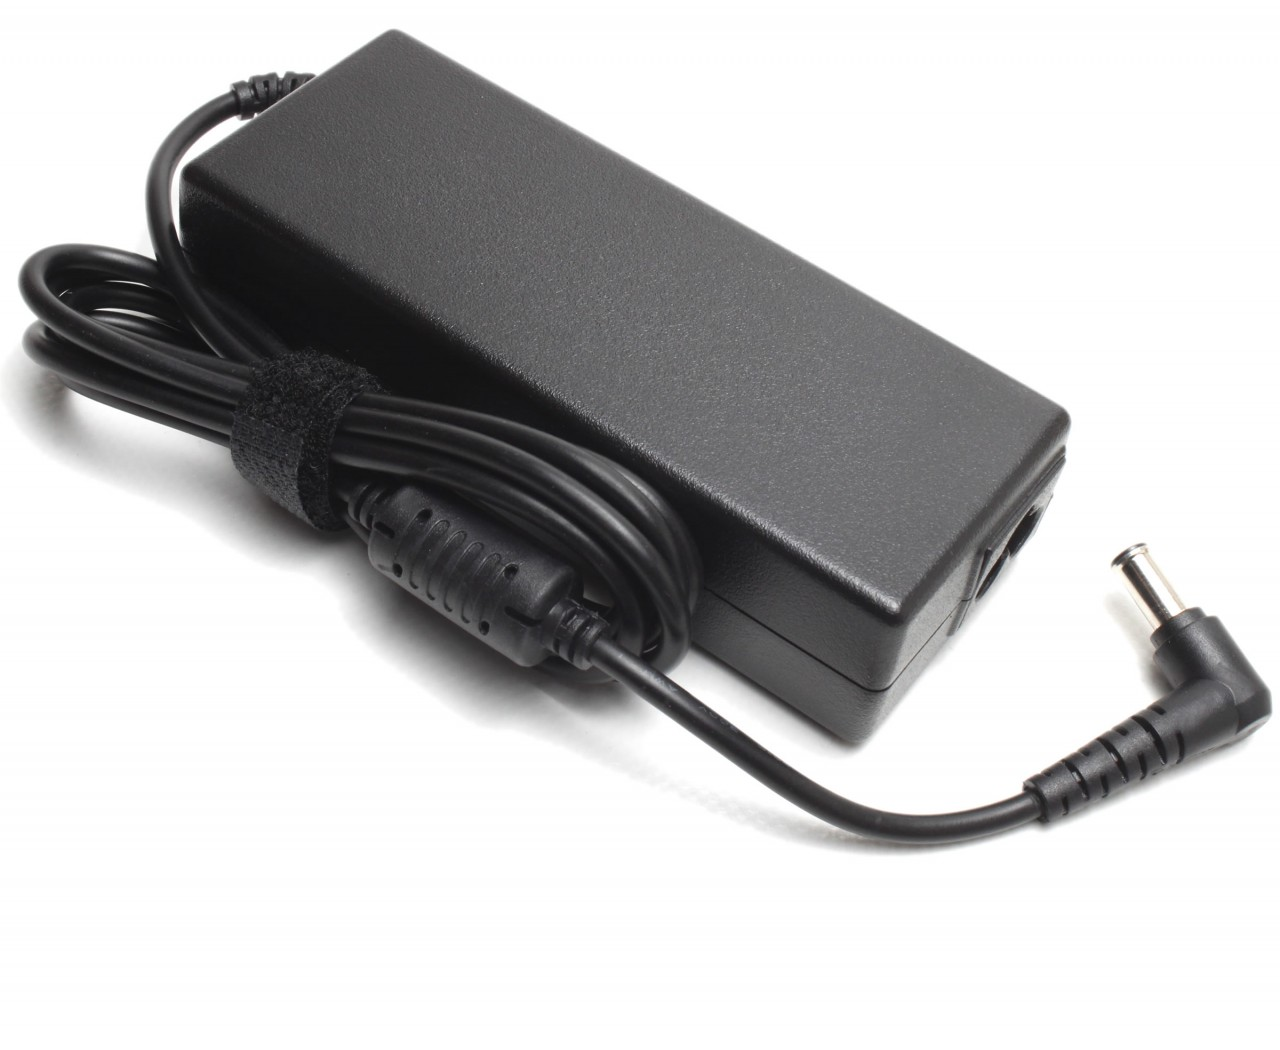 Incarcator Sony VGP AC19V13 Replacement imagine powerlaptop.ro 2021